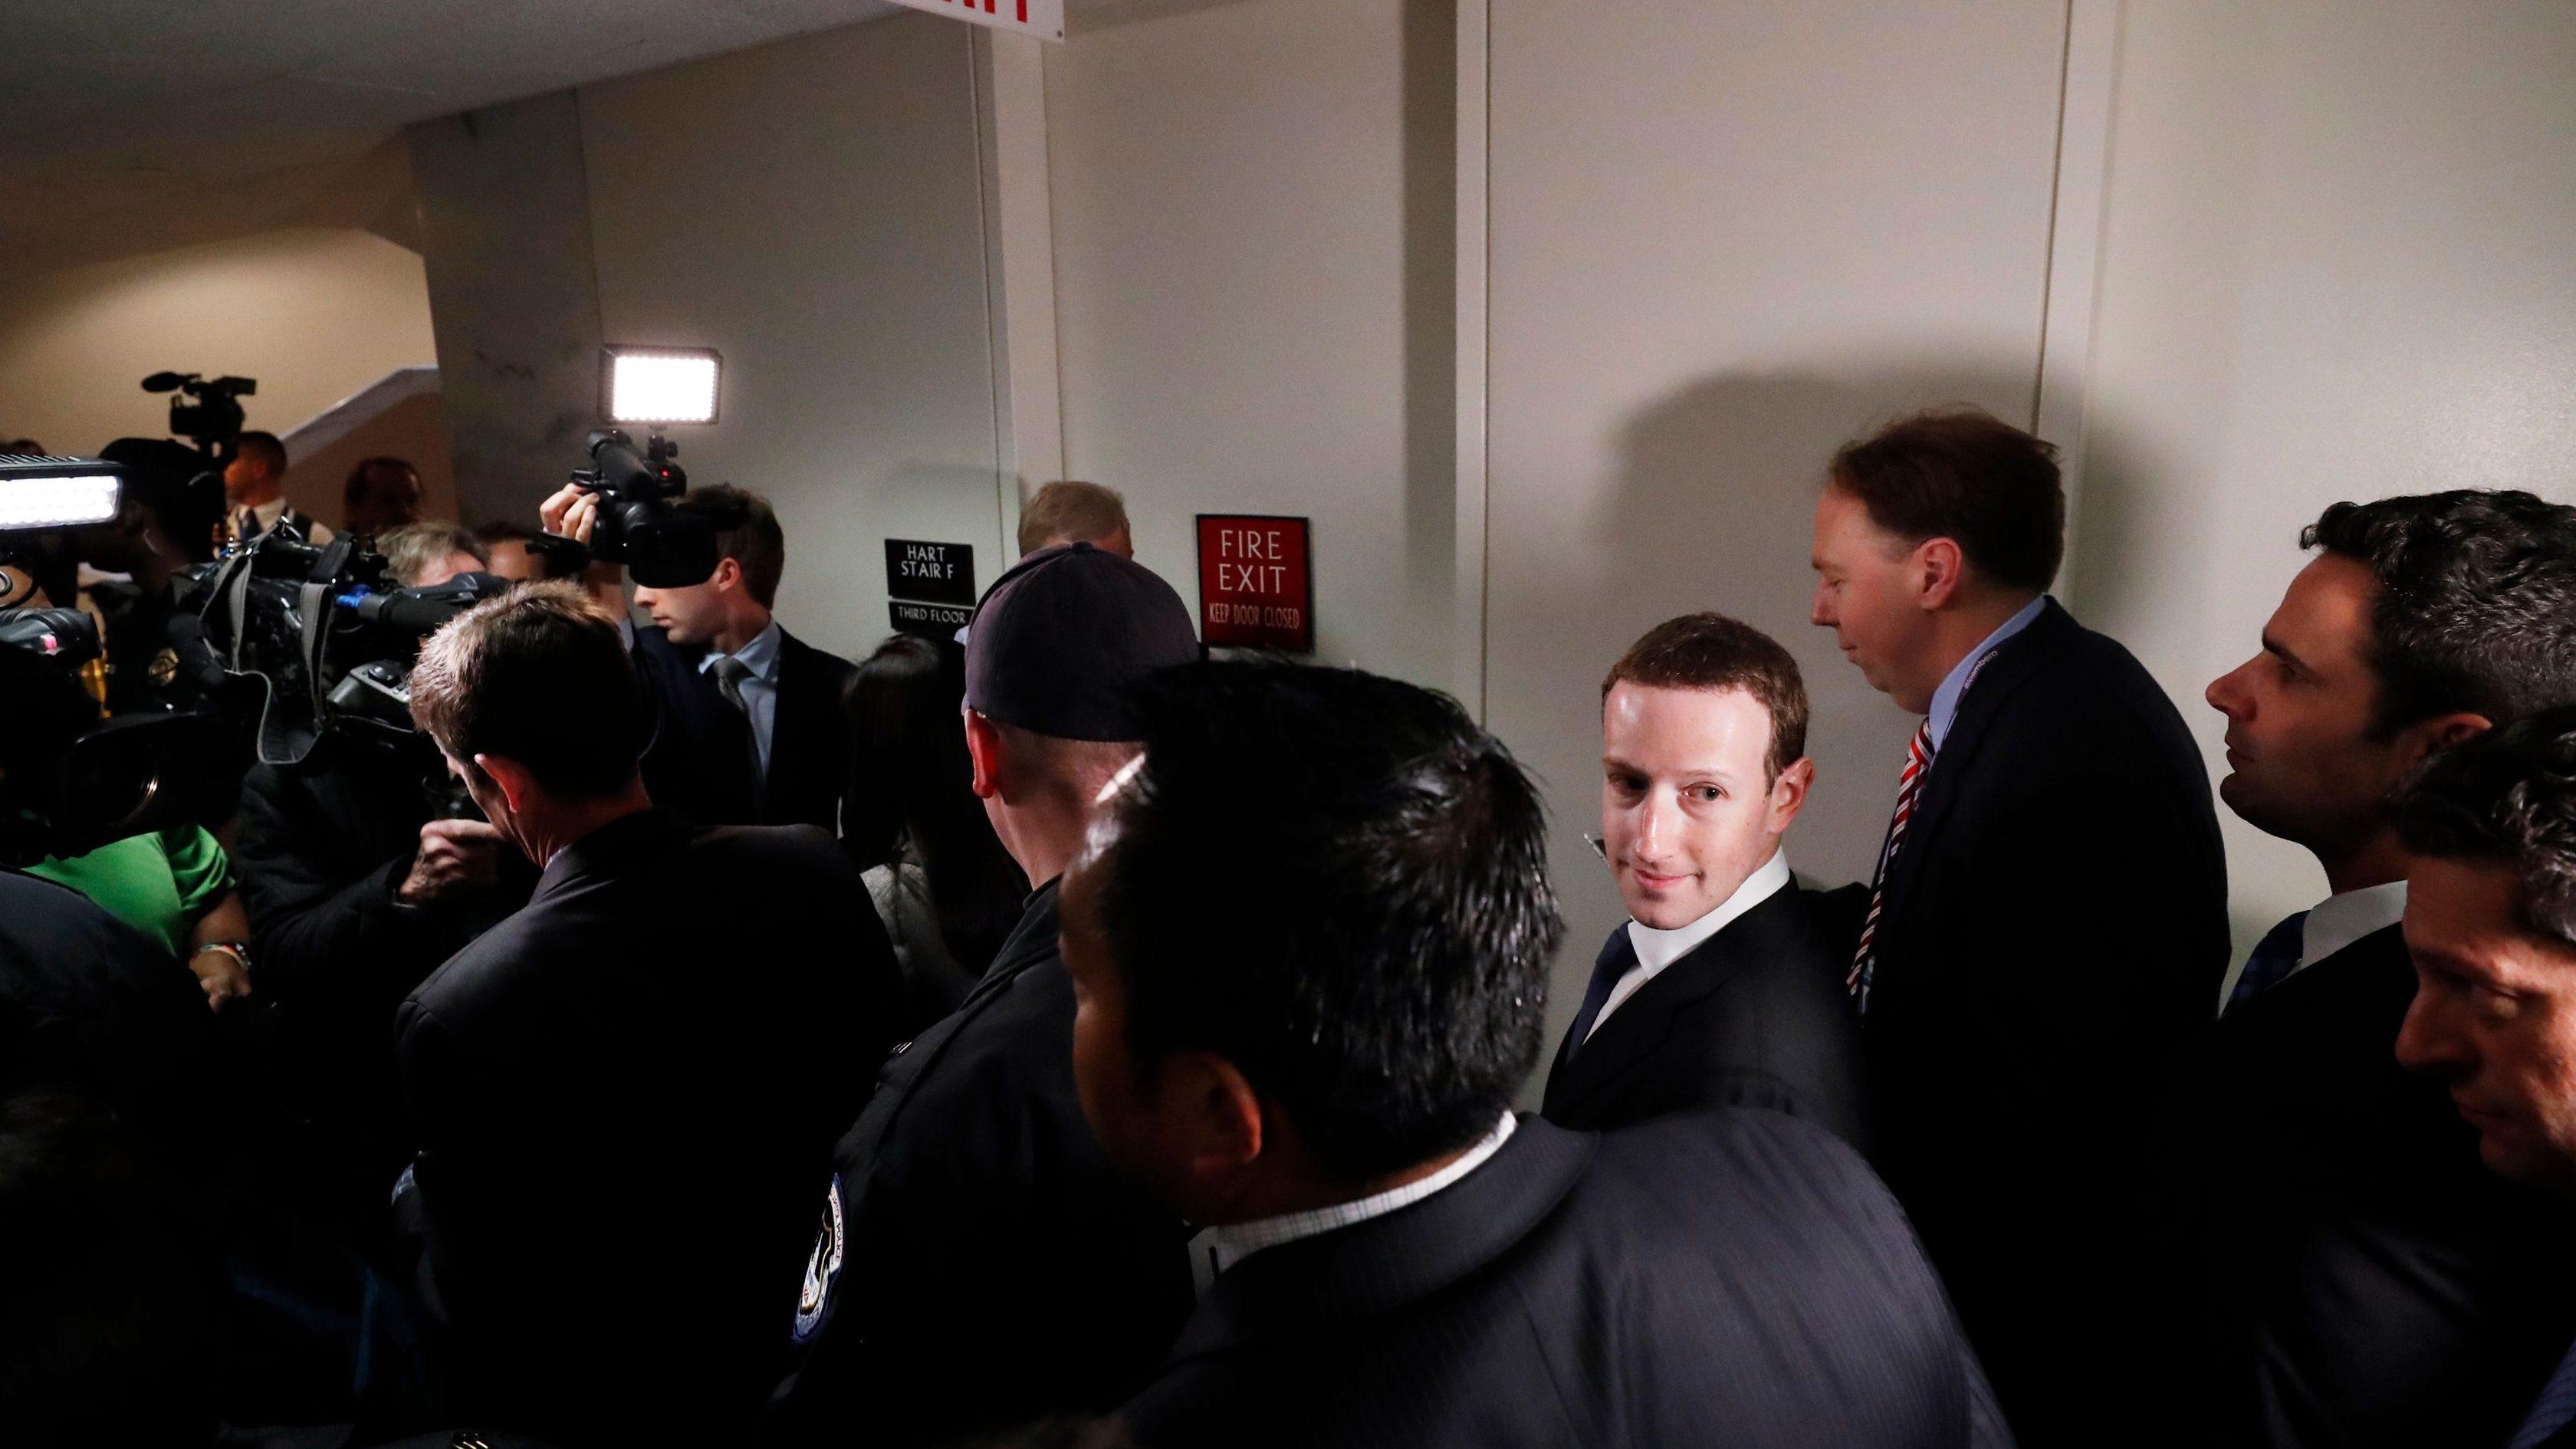 Facebook CEO Mark Zuckerberg looks back while walking to a meeting with U.S. Senator John Thune (R-SD) on Capitol Hill in Washington, U.S., April 9, 2018. REUTERS/Leah Millis - HP1EE491K0Q4C